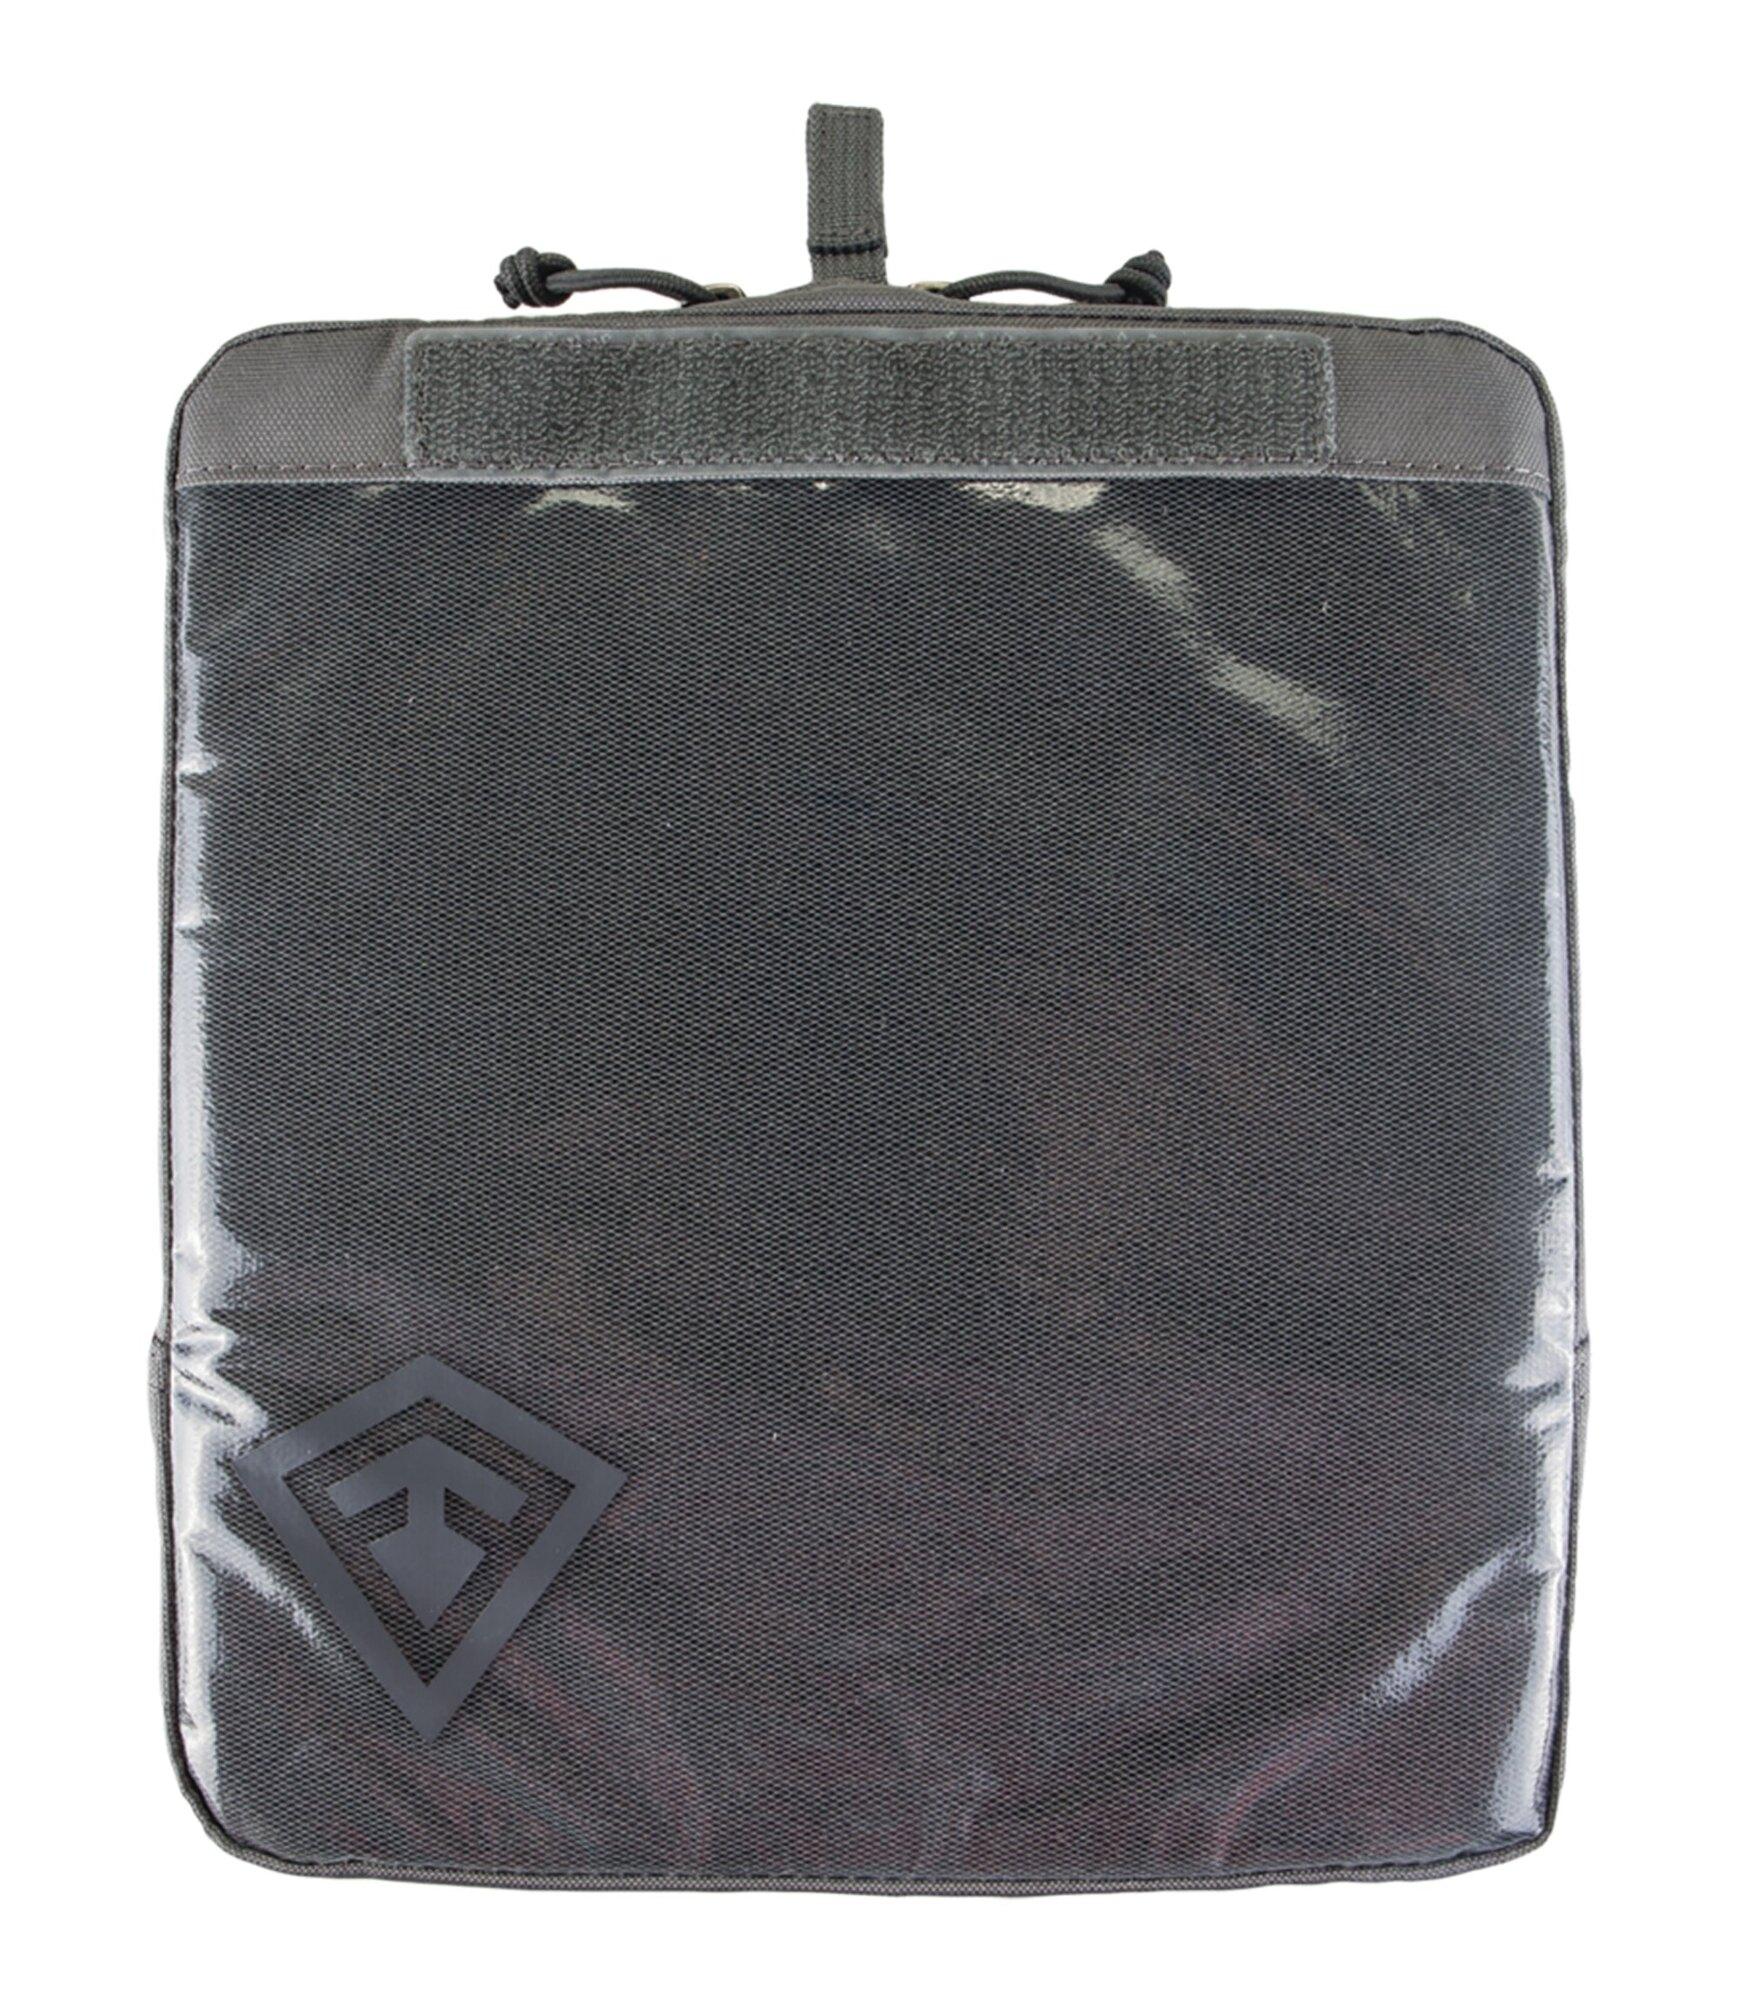 Puzdro Velcro 9x10 First Tactical® - sivé